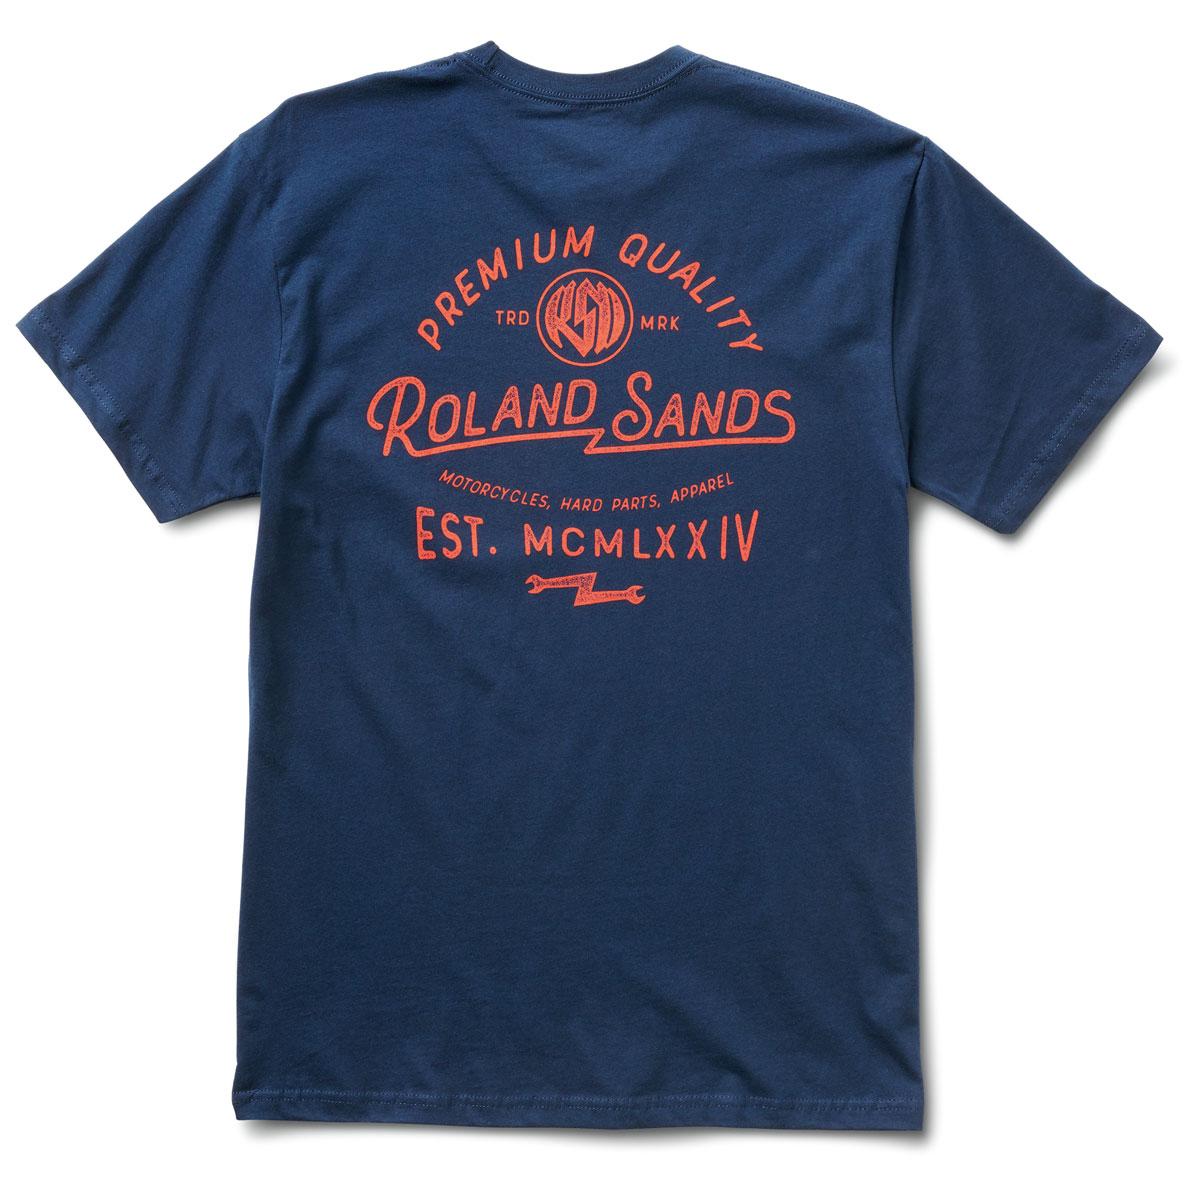 Roland Sands Design Apparel Men's Roman 74 Navy Blue T-Shirt